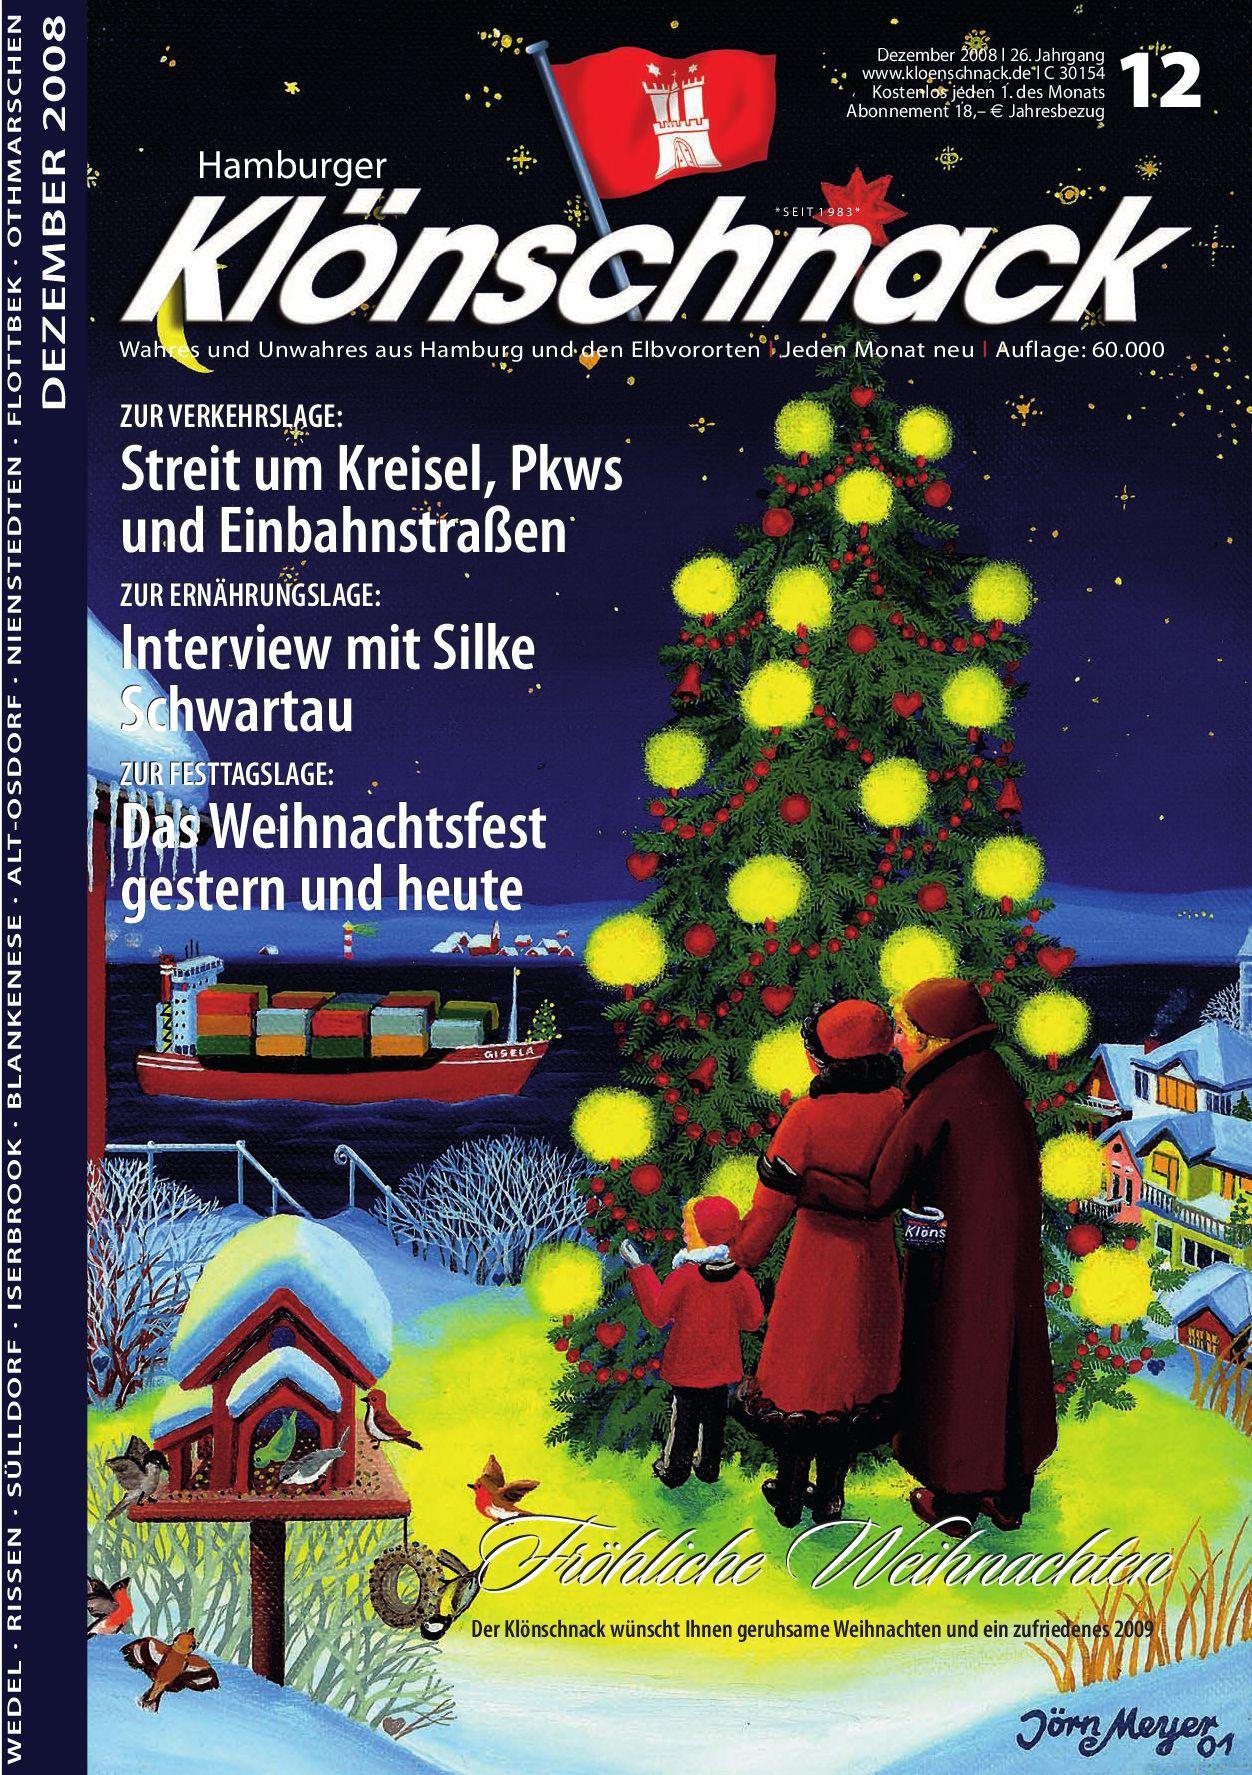 Hamburger Klönschnack - Dezember \'08 by Hamburger Klönschnack - issuu